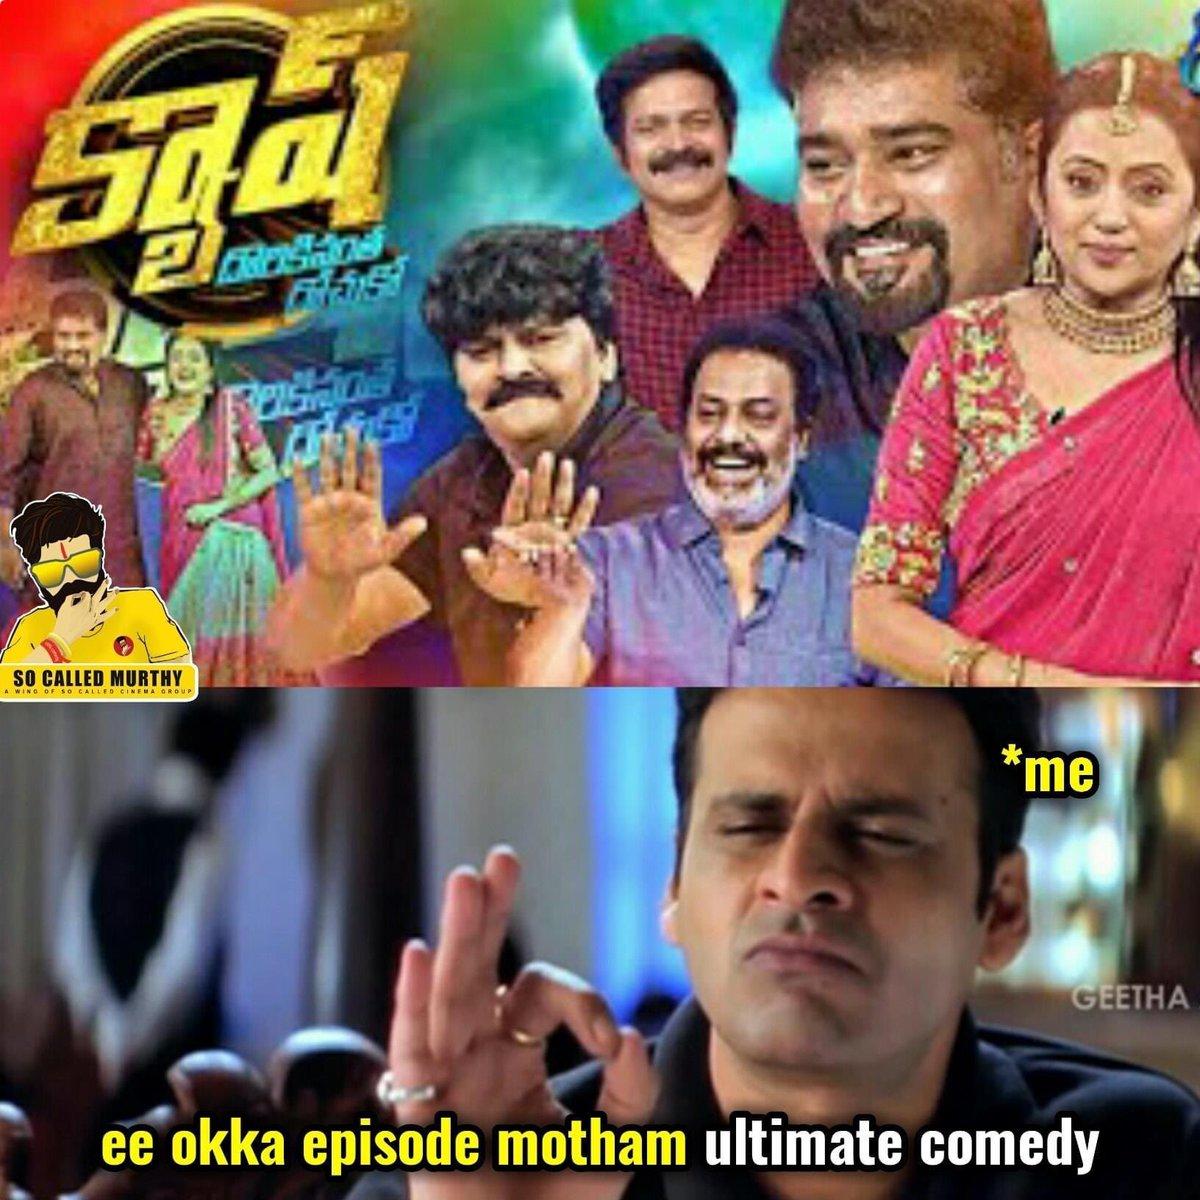 One of the Best Episodes..!!  Sameer, RajaRaveendra & @actorbrahmaji @RajeevCo tho oka manchi Comedy series plan cheyochu👌🏻👌🏻 Adirindi..!!   #Cash #SoCalledCinema https://t.co/N7pjox5DUj